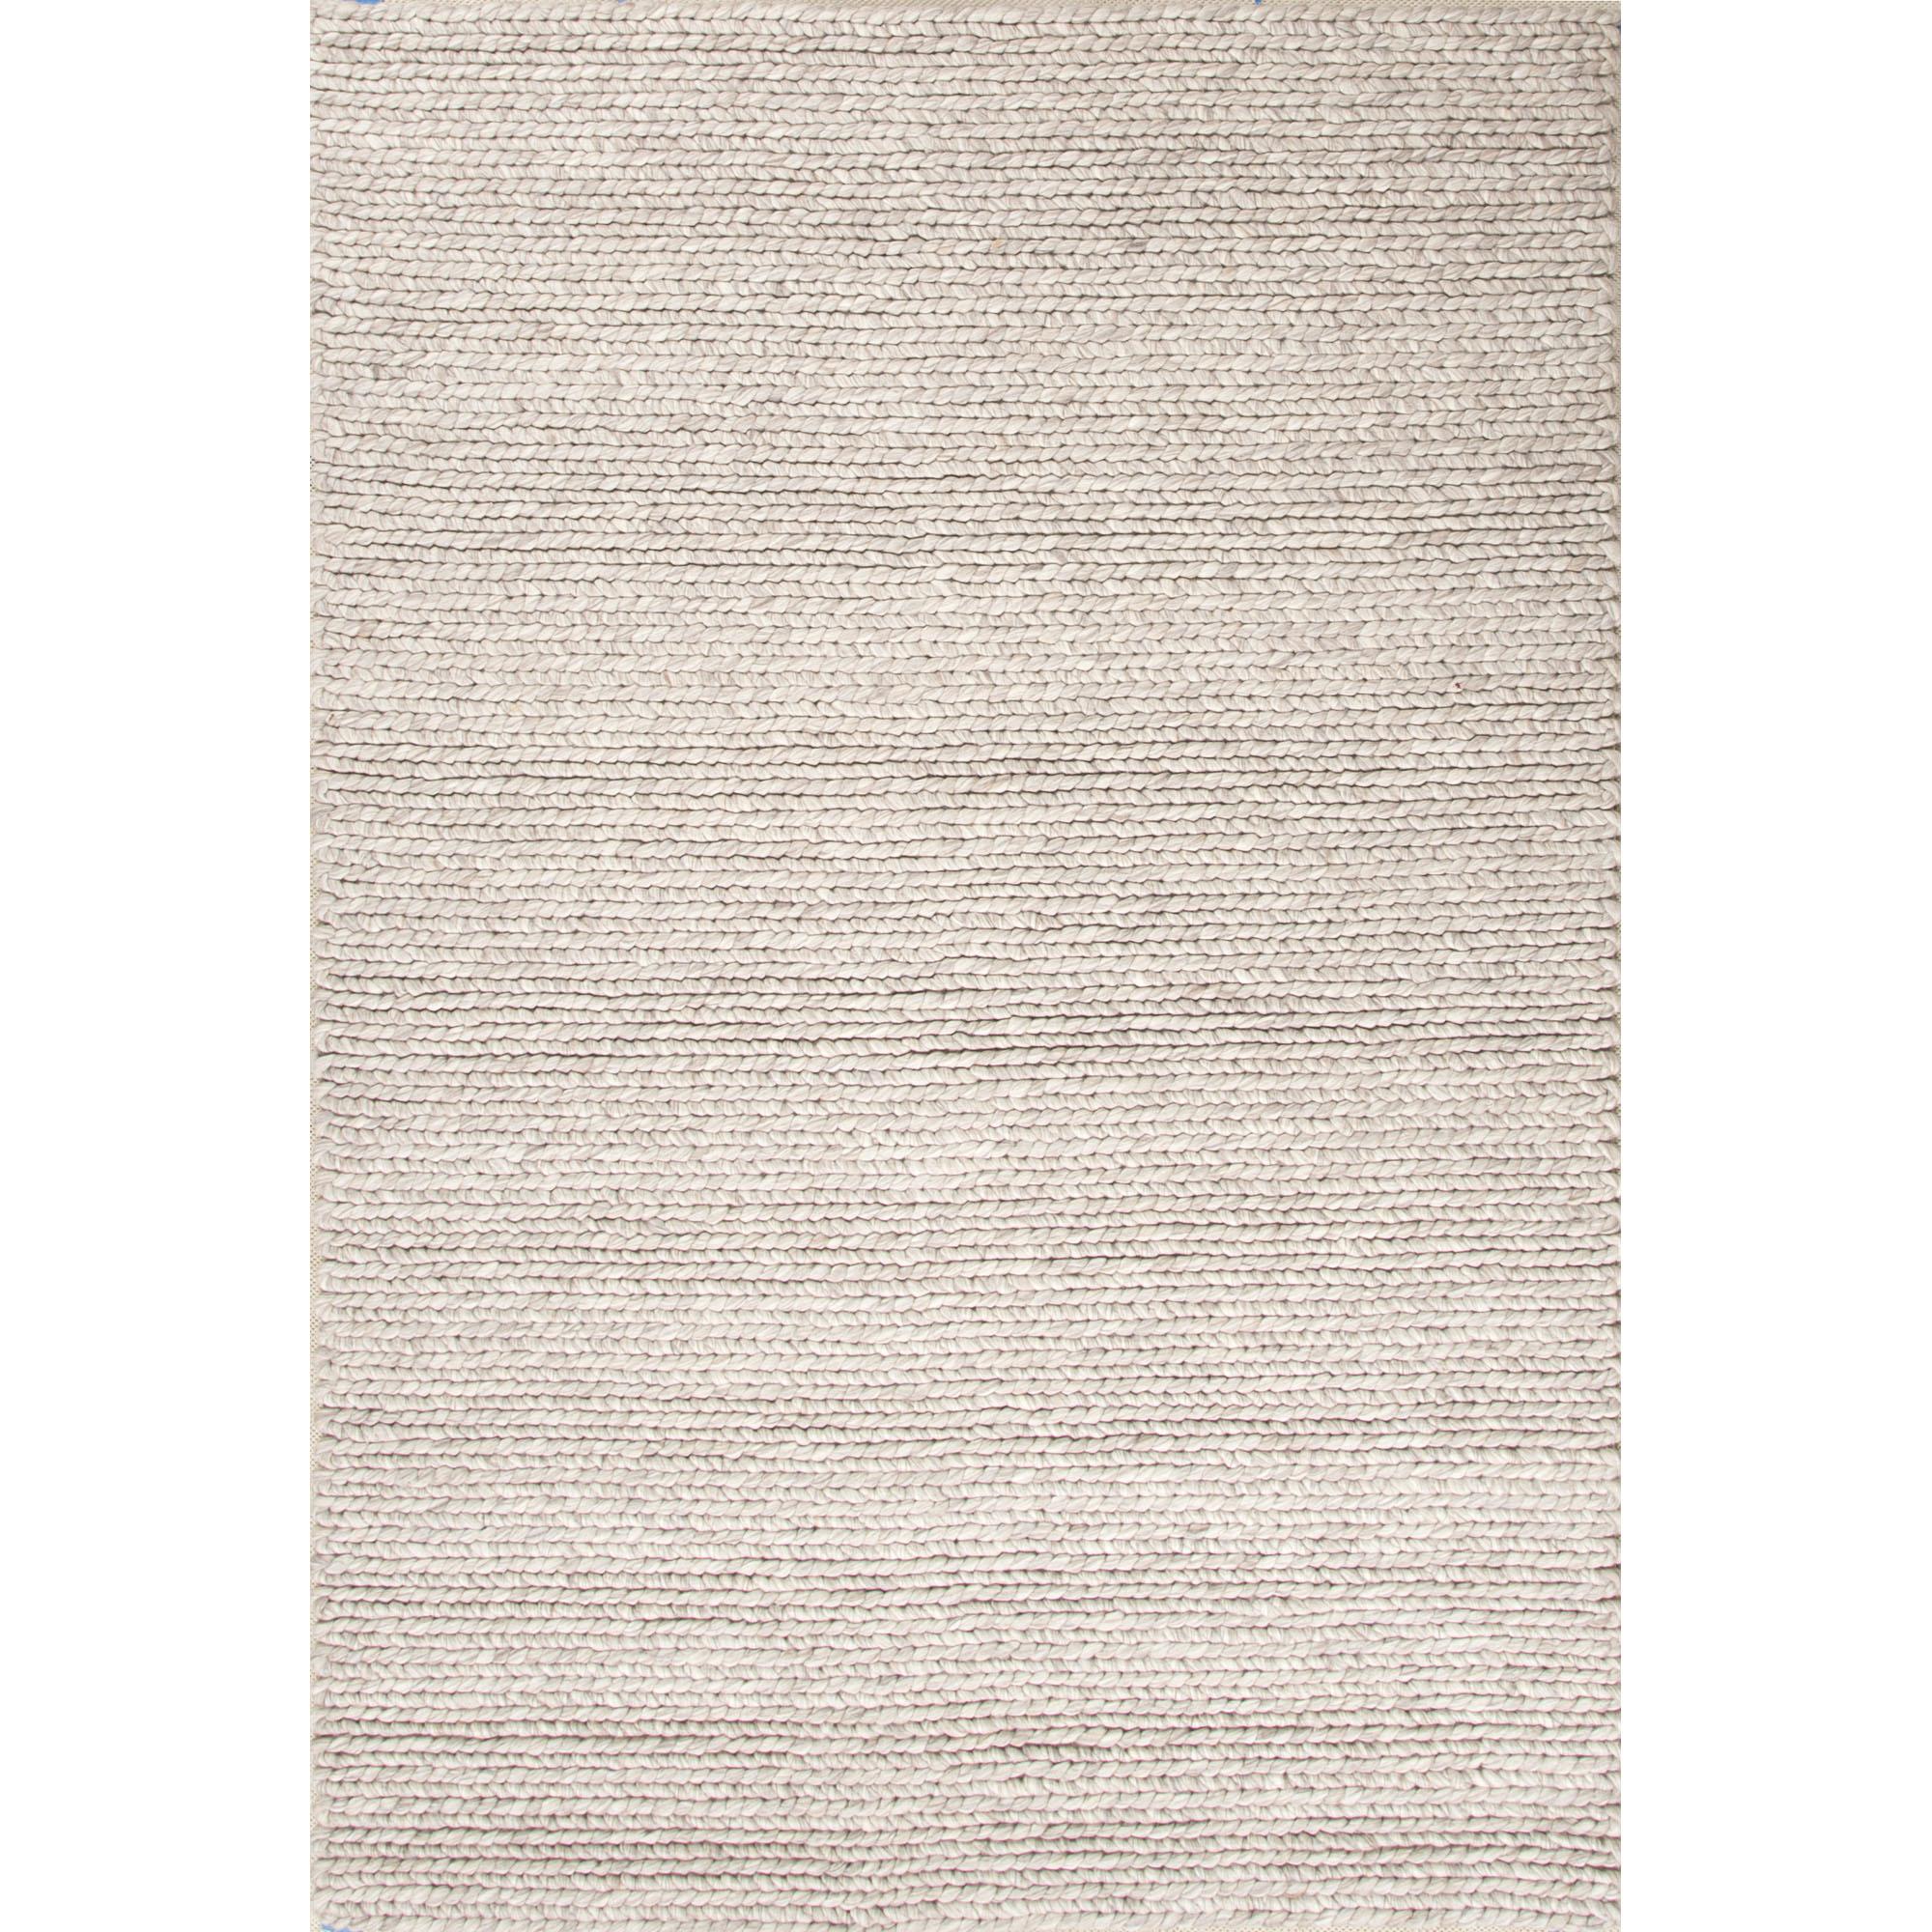 JAIPUR Rugs Scandinavia Dula 5 x 8 Rug - Item Number: RUG108328